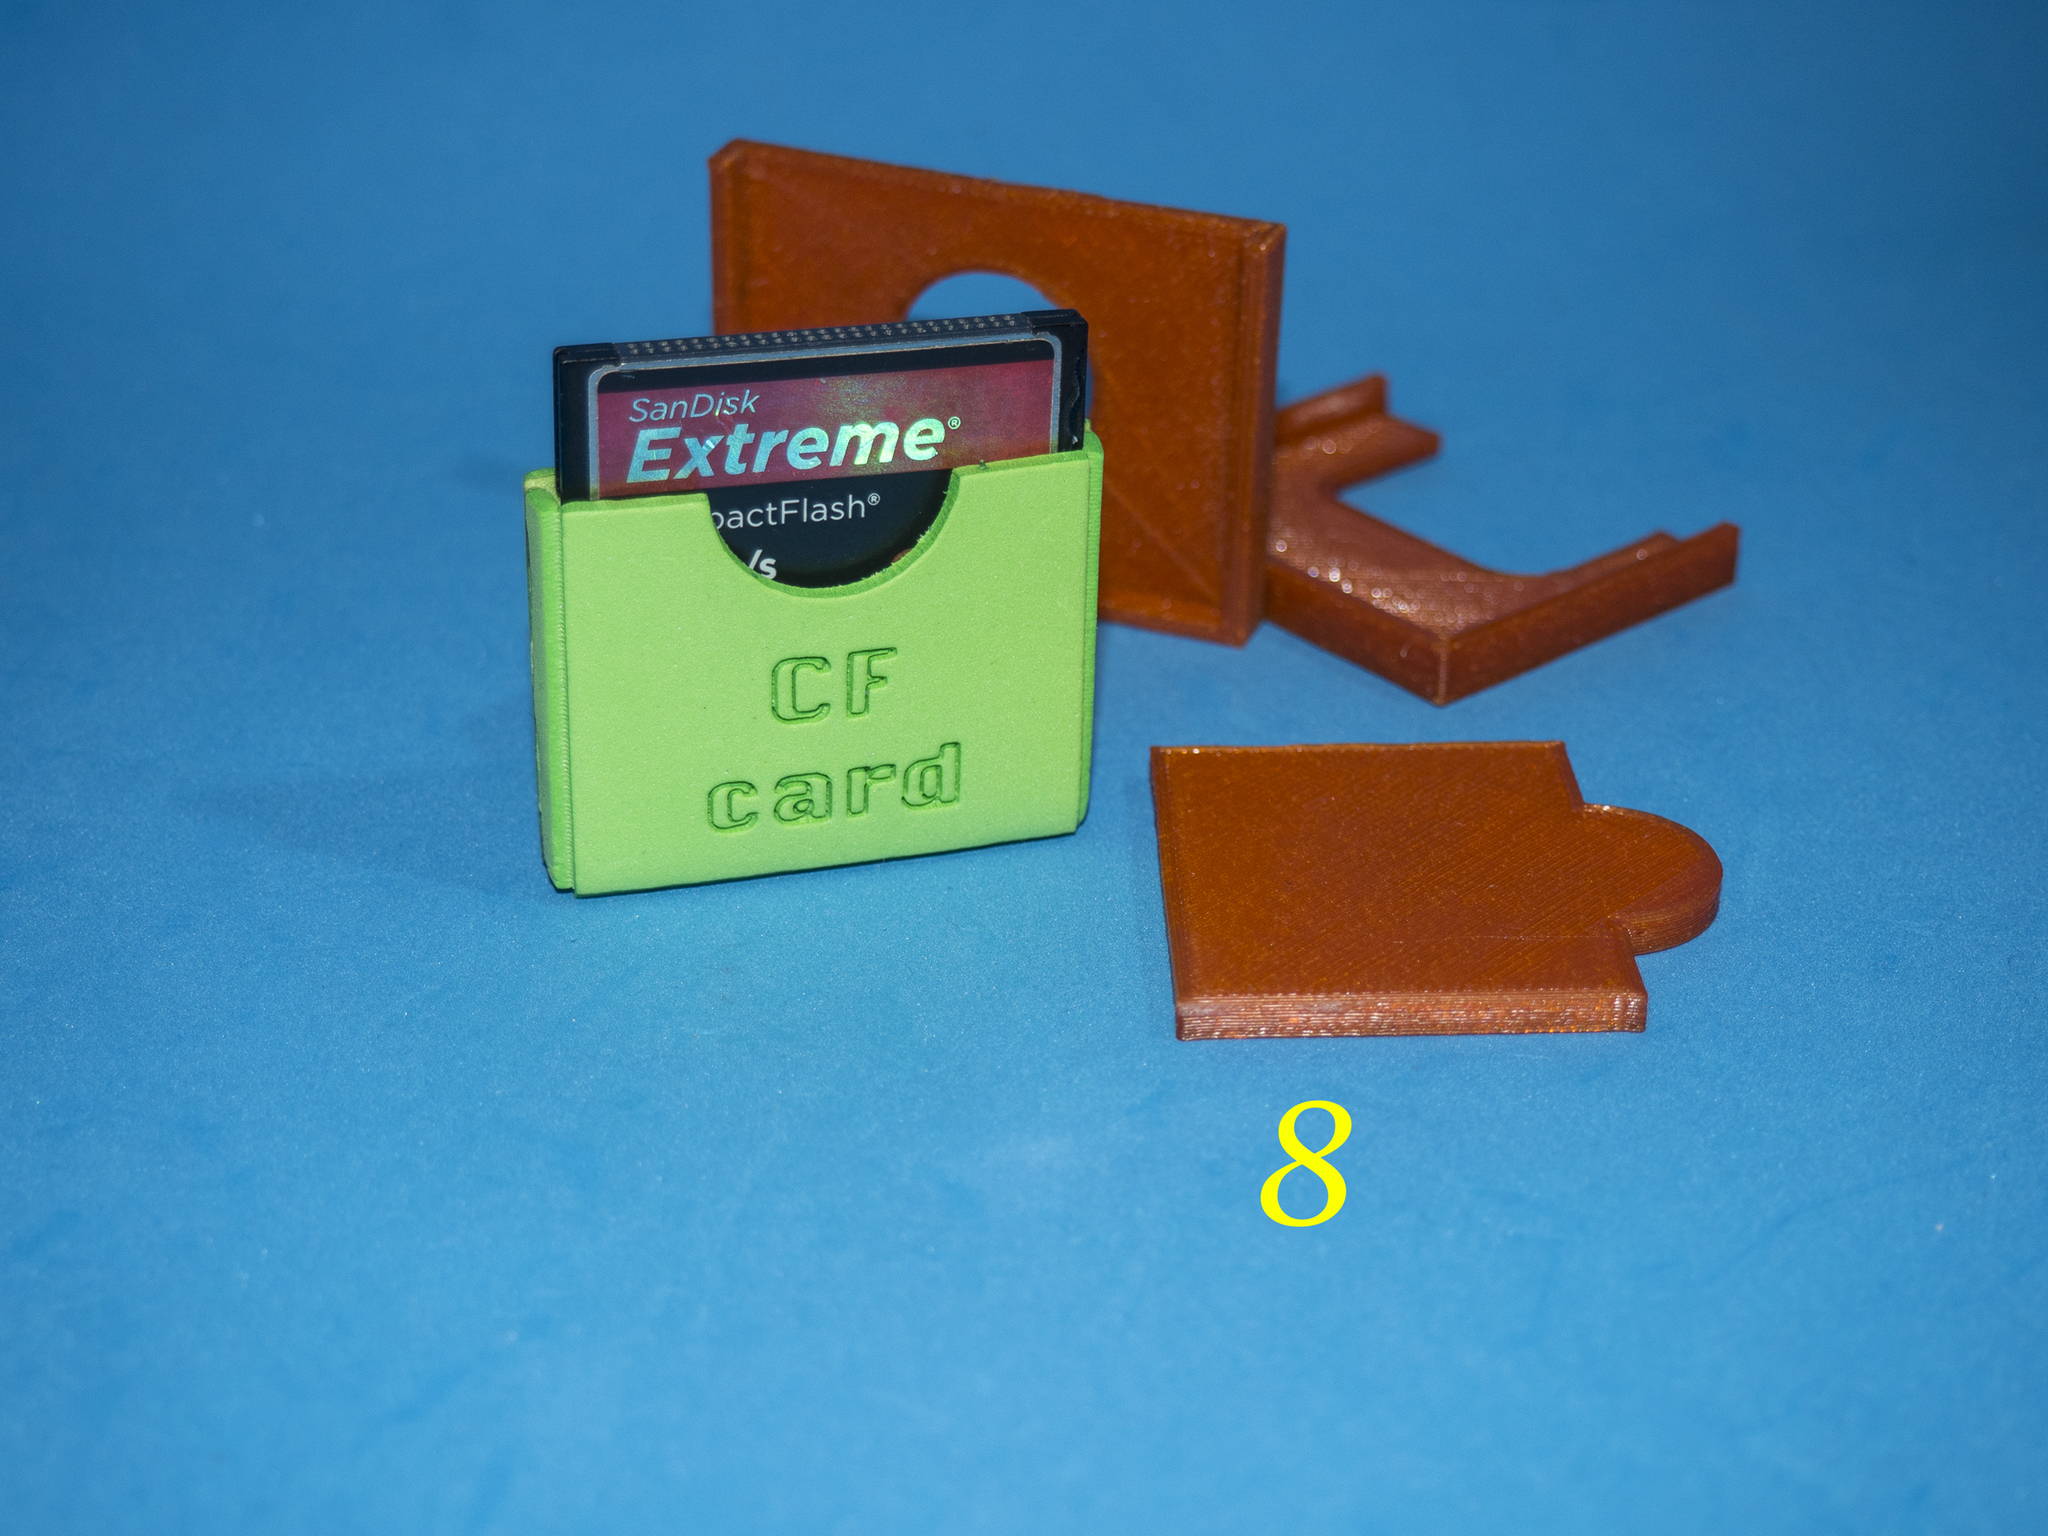 9.jpg Download free STL file Lasercut EVA foam CF Card sleeve + gluing jig • 3D printing template, dancingchicken